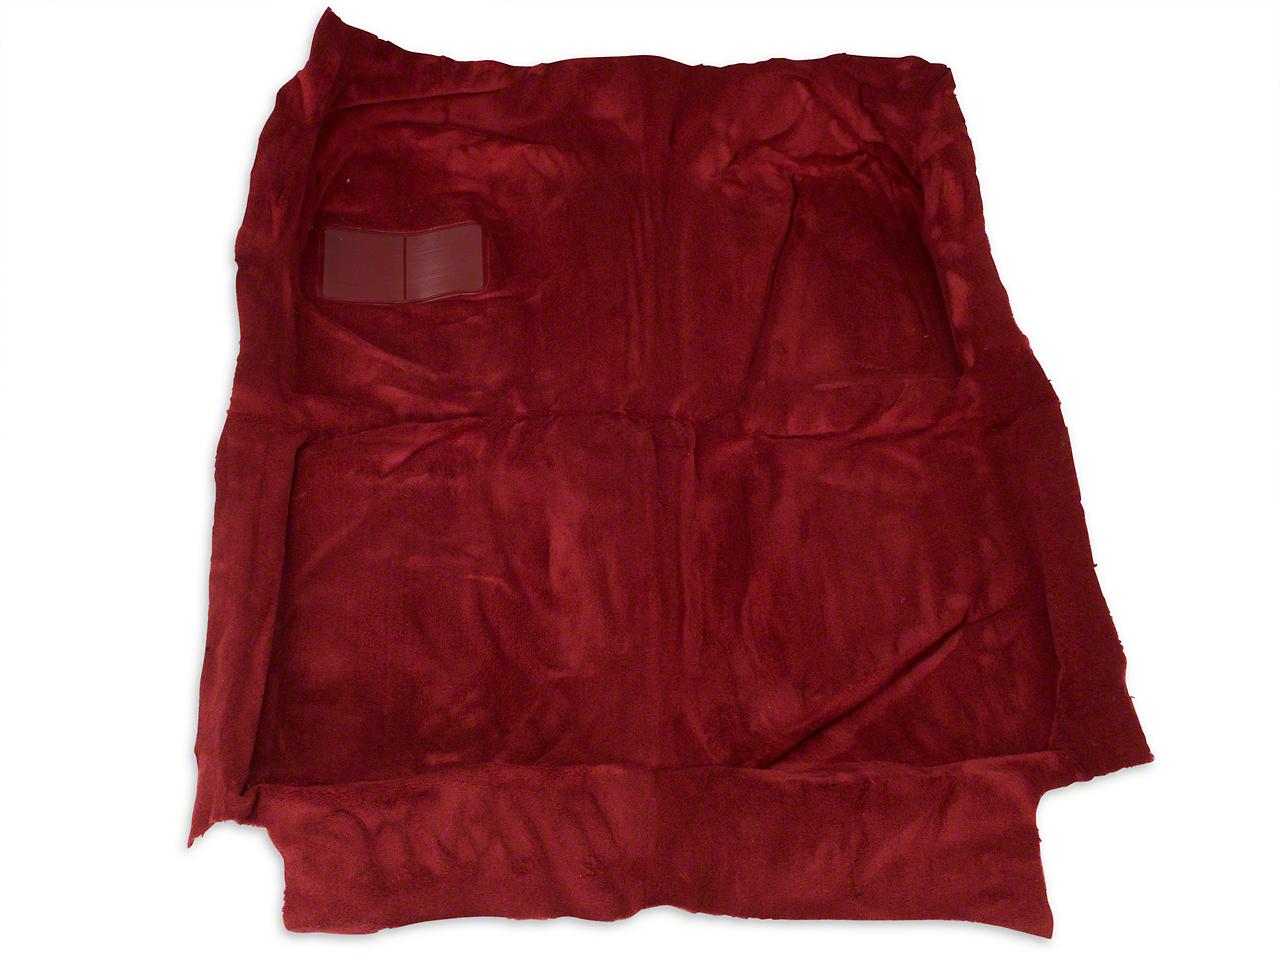 OPR Replacement Floor Carpet - Red (82-93 Convertible)